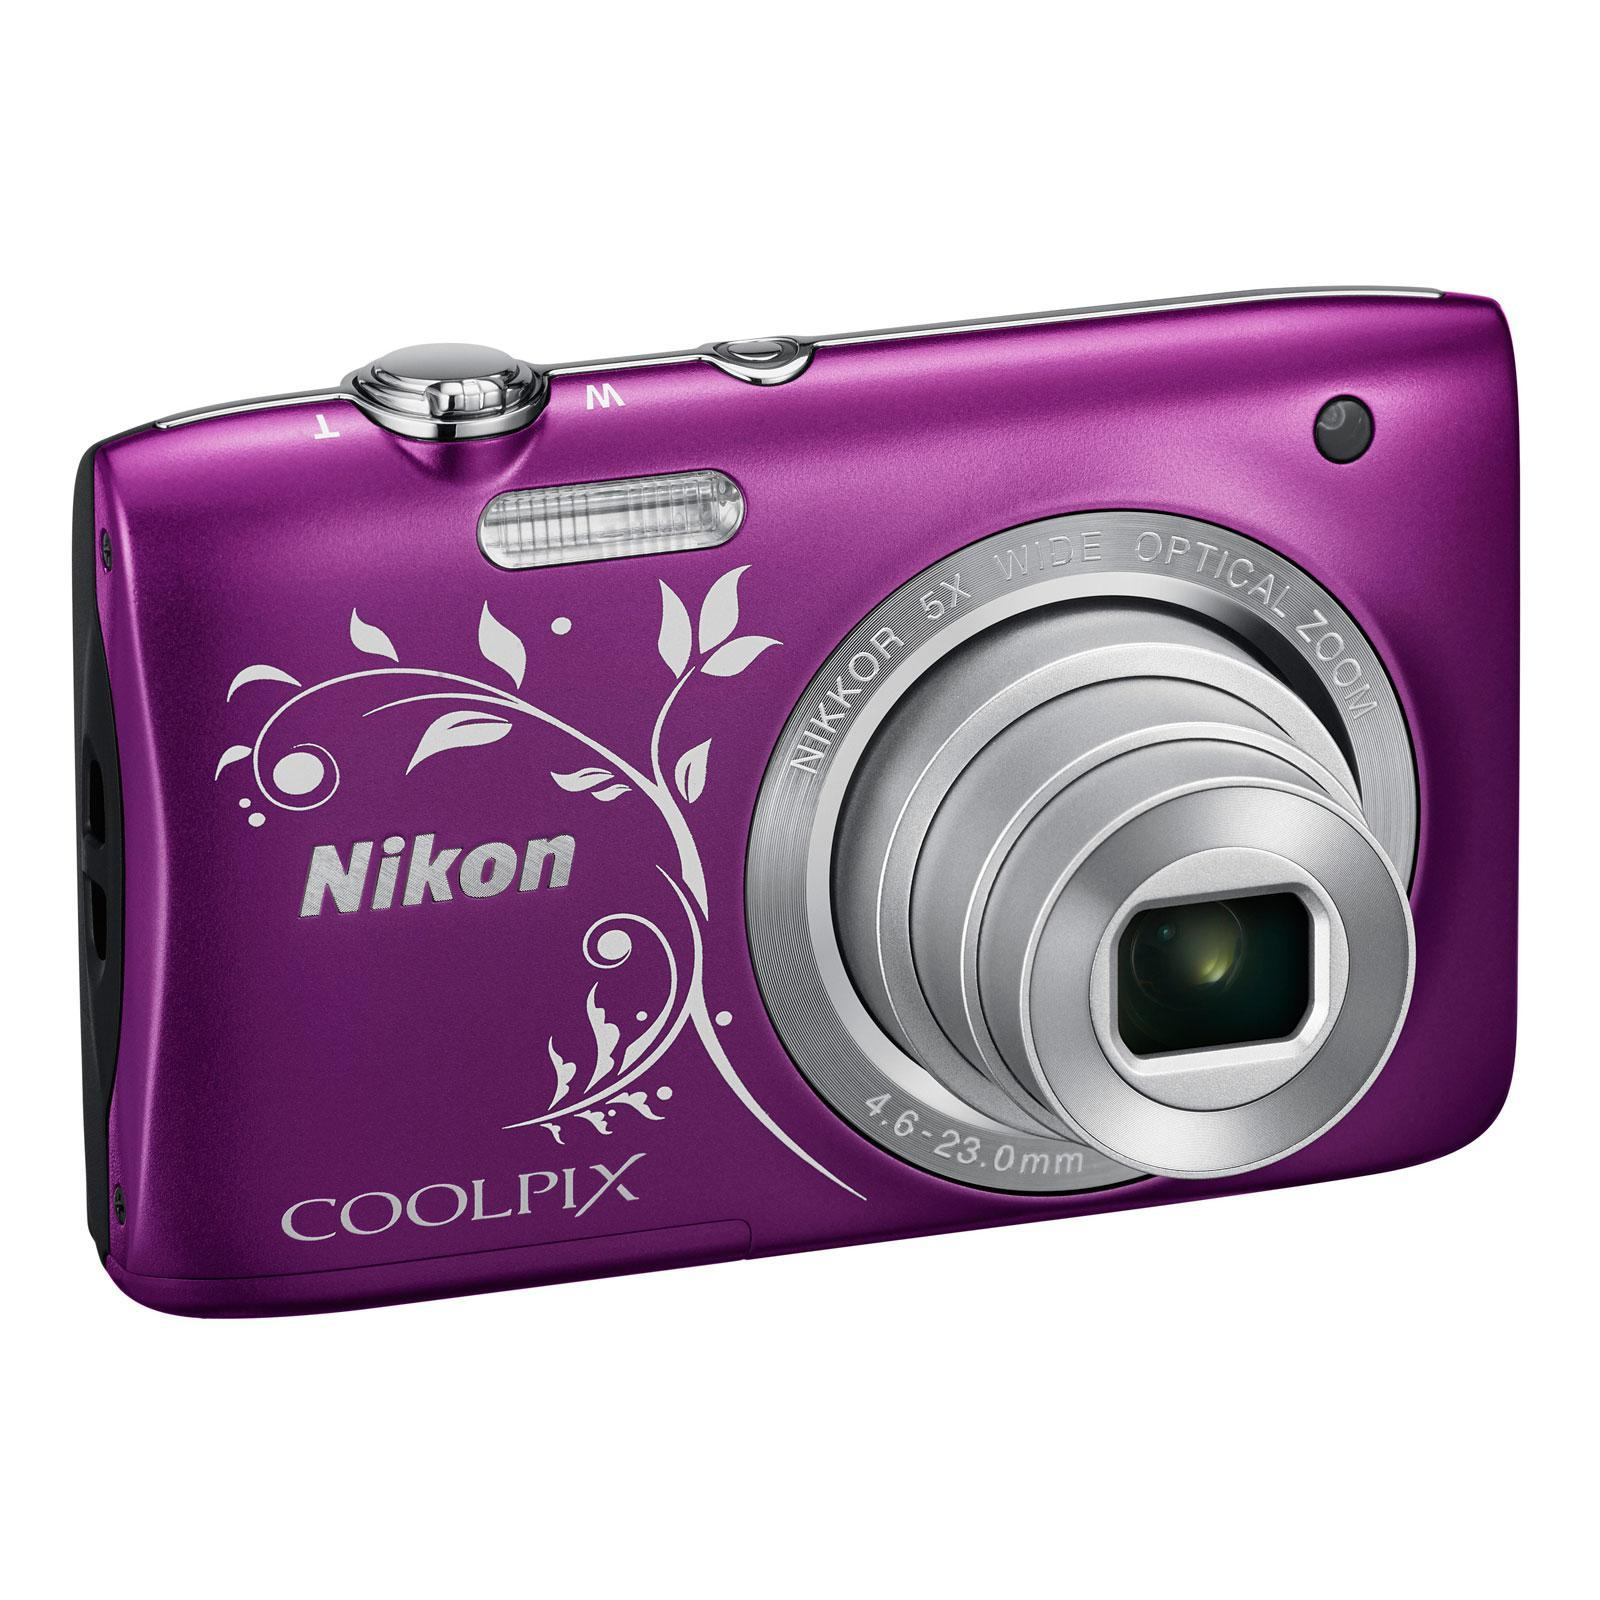 Nikon - COOLPIX S2900 - Prune